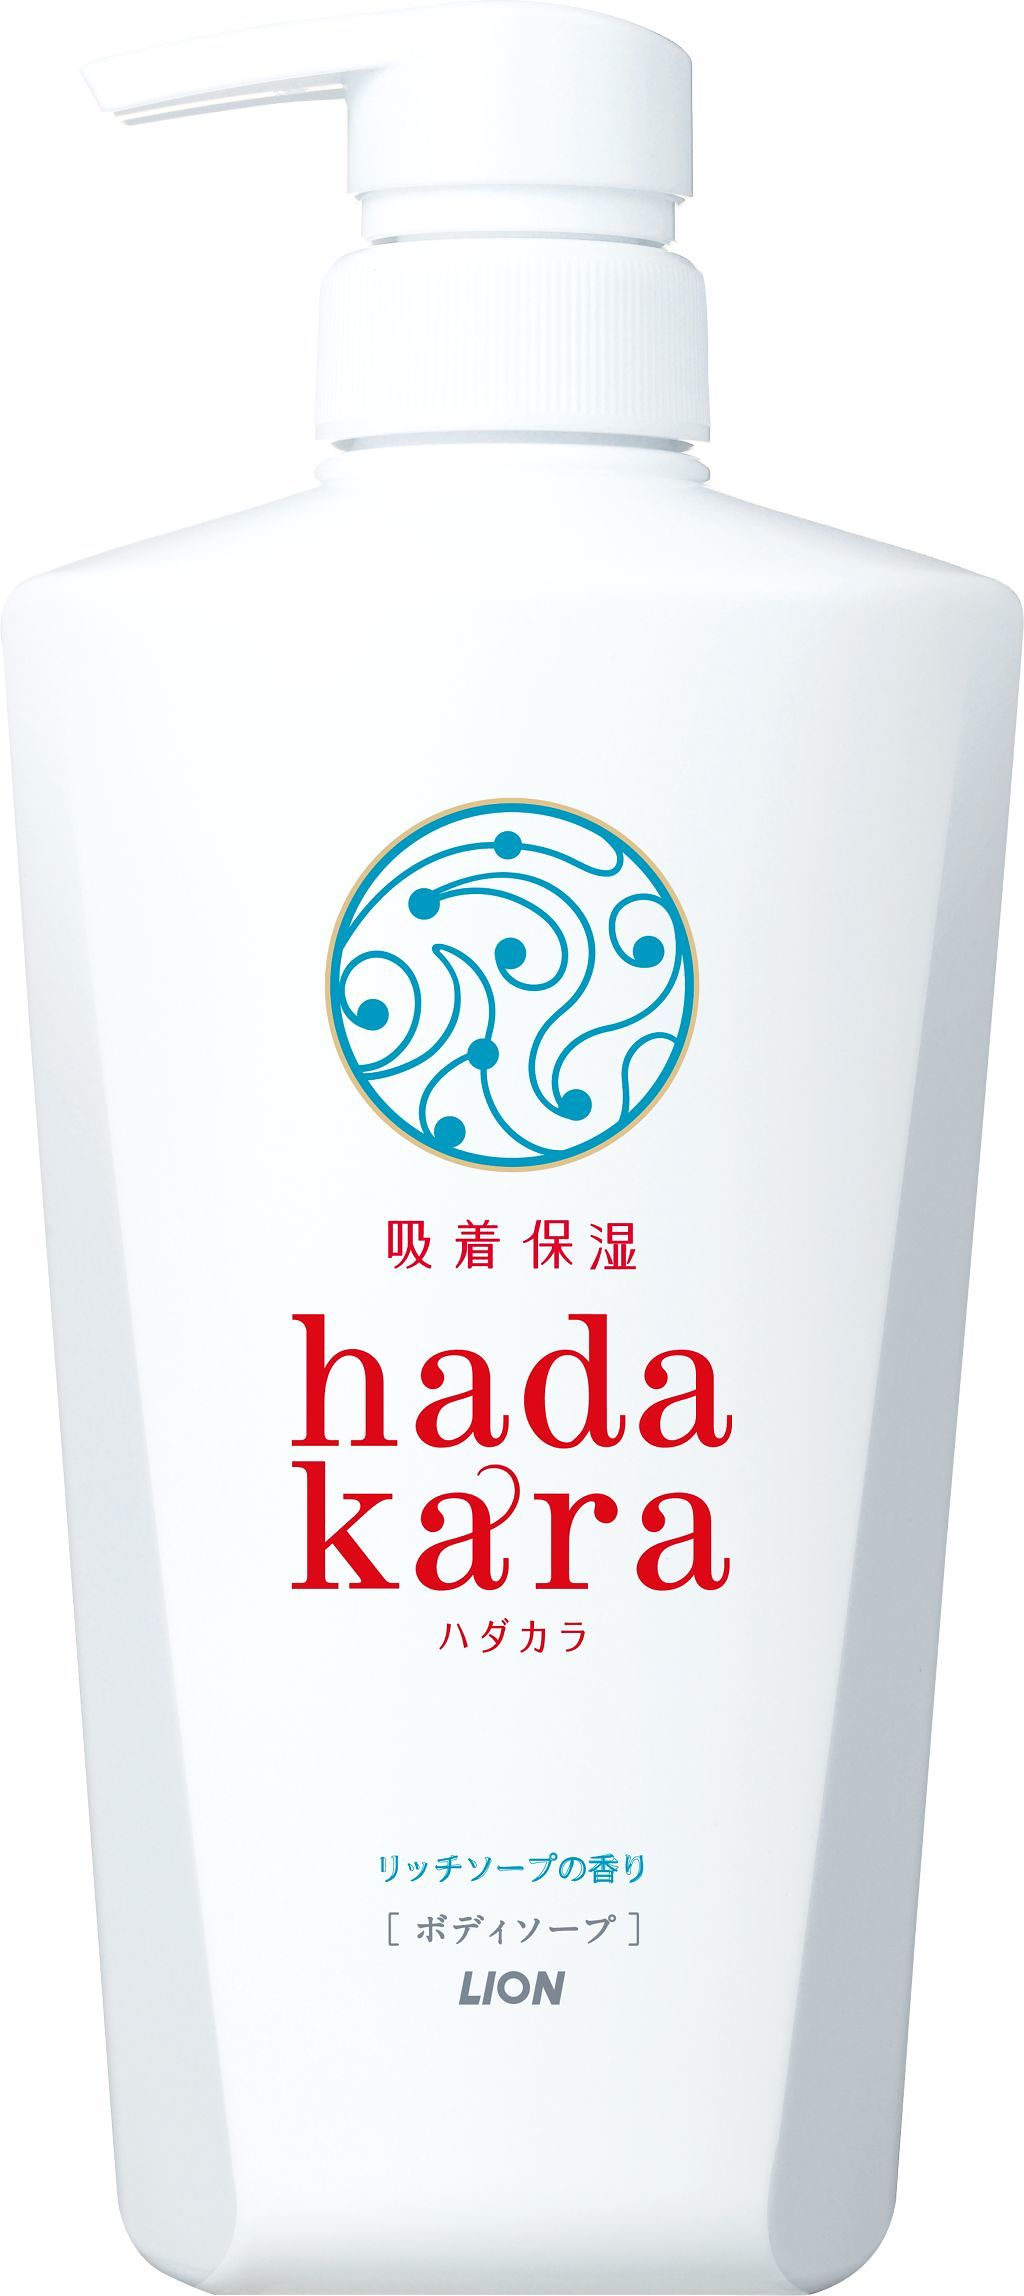 hadakara ボディソープ リッチソープの香り hadakara